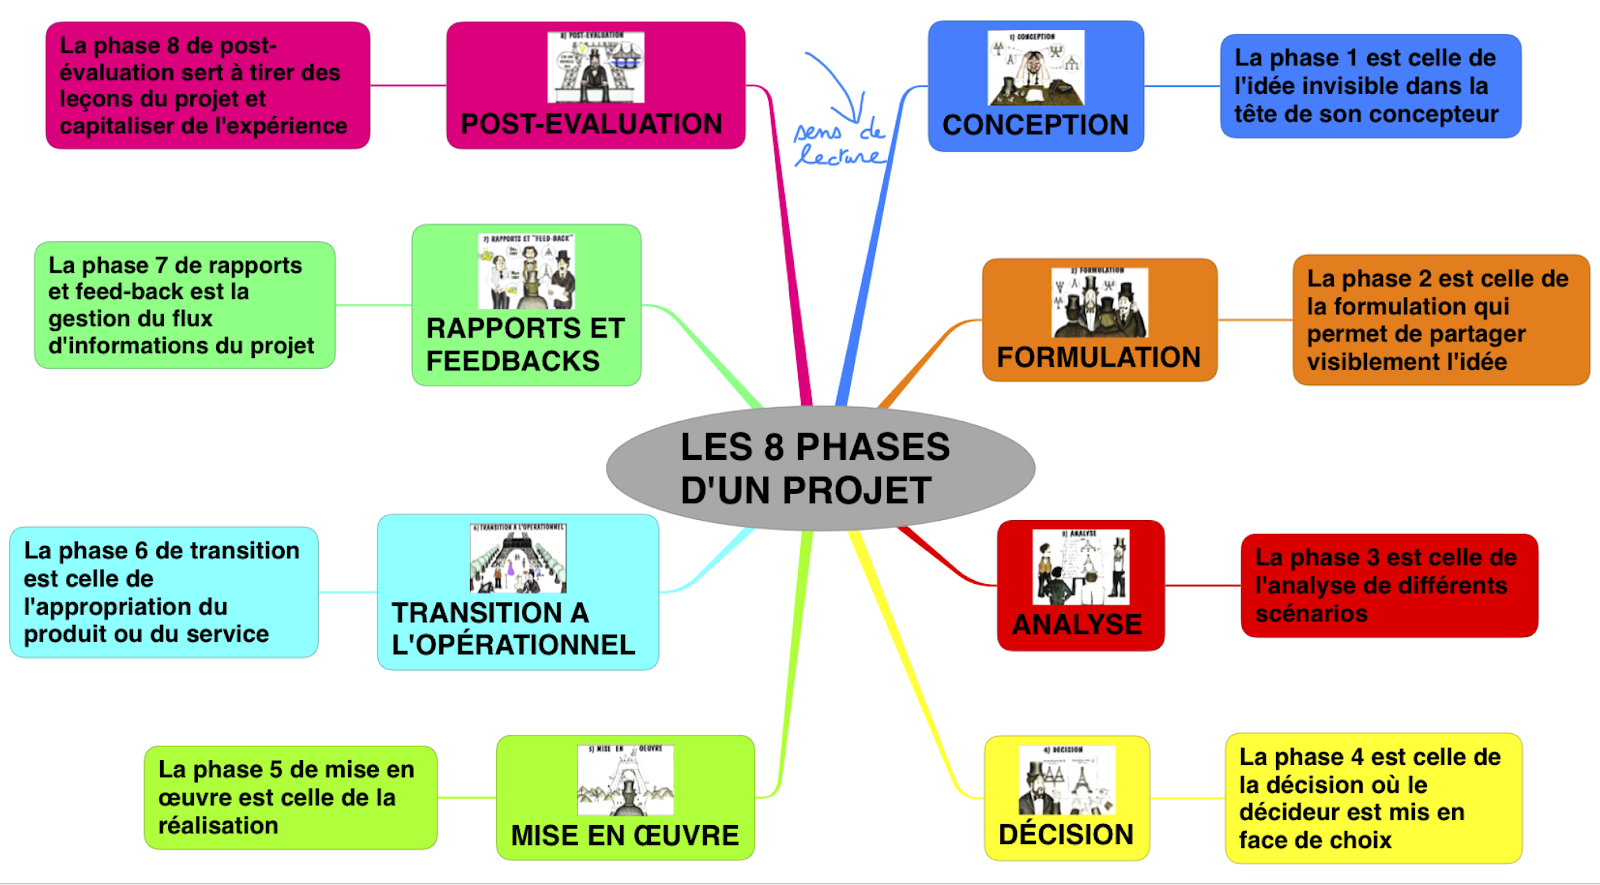 Transformation experimentation phase 2 - 3 6